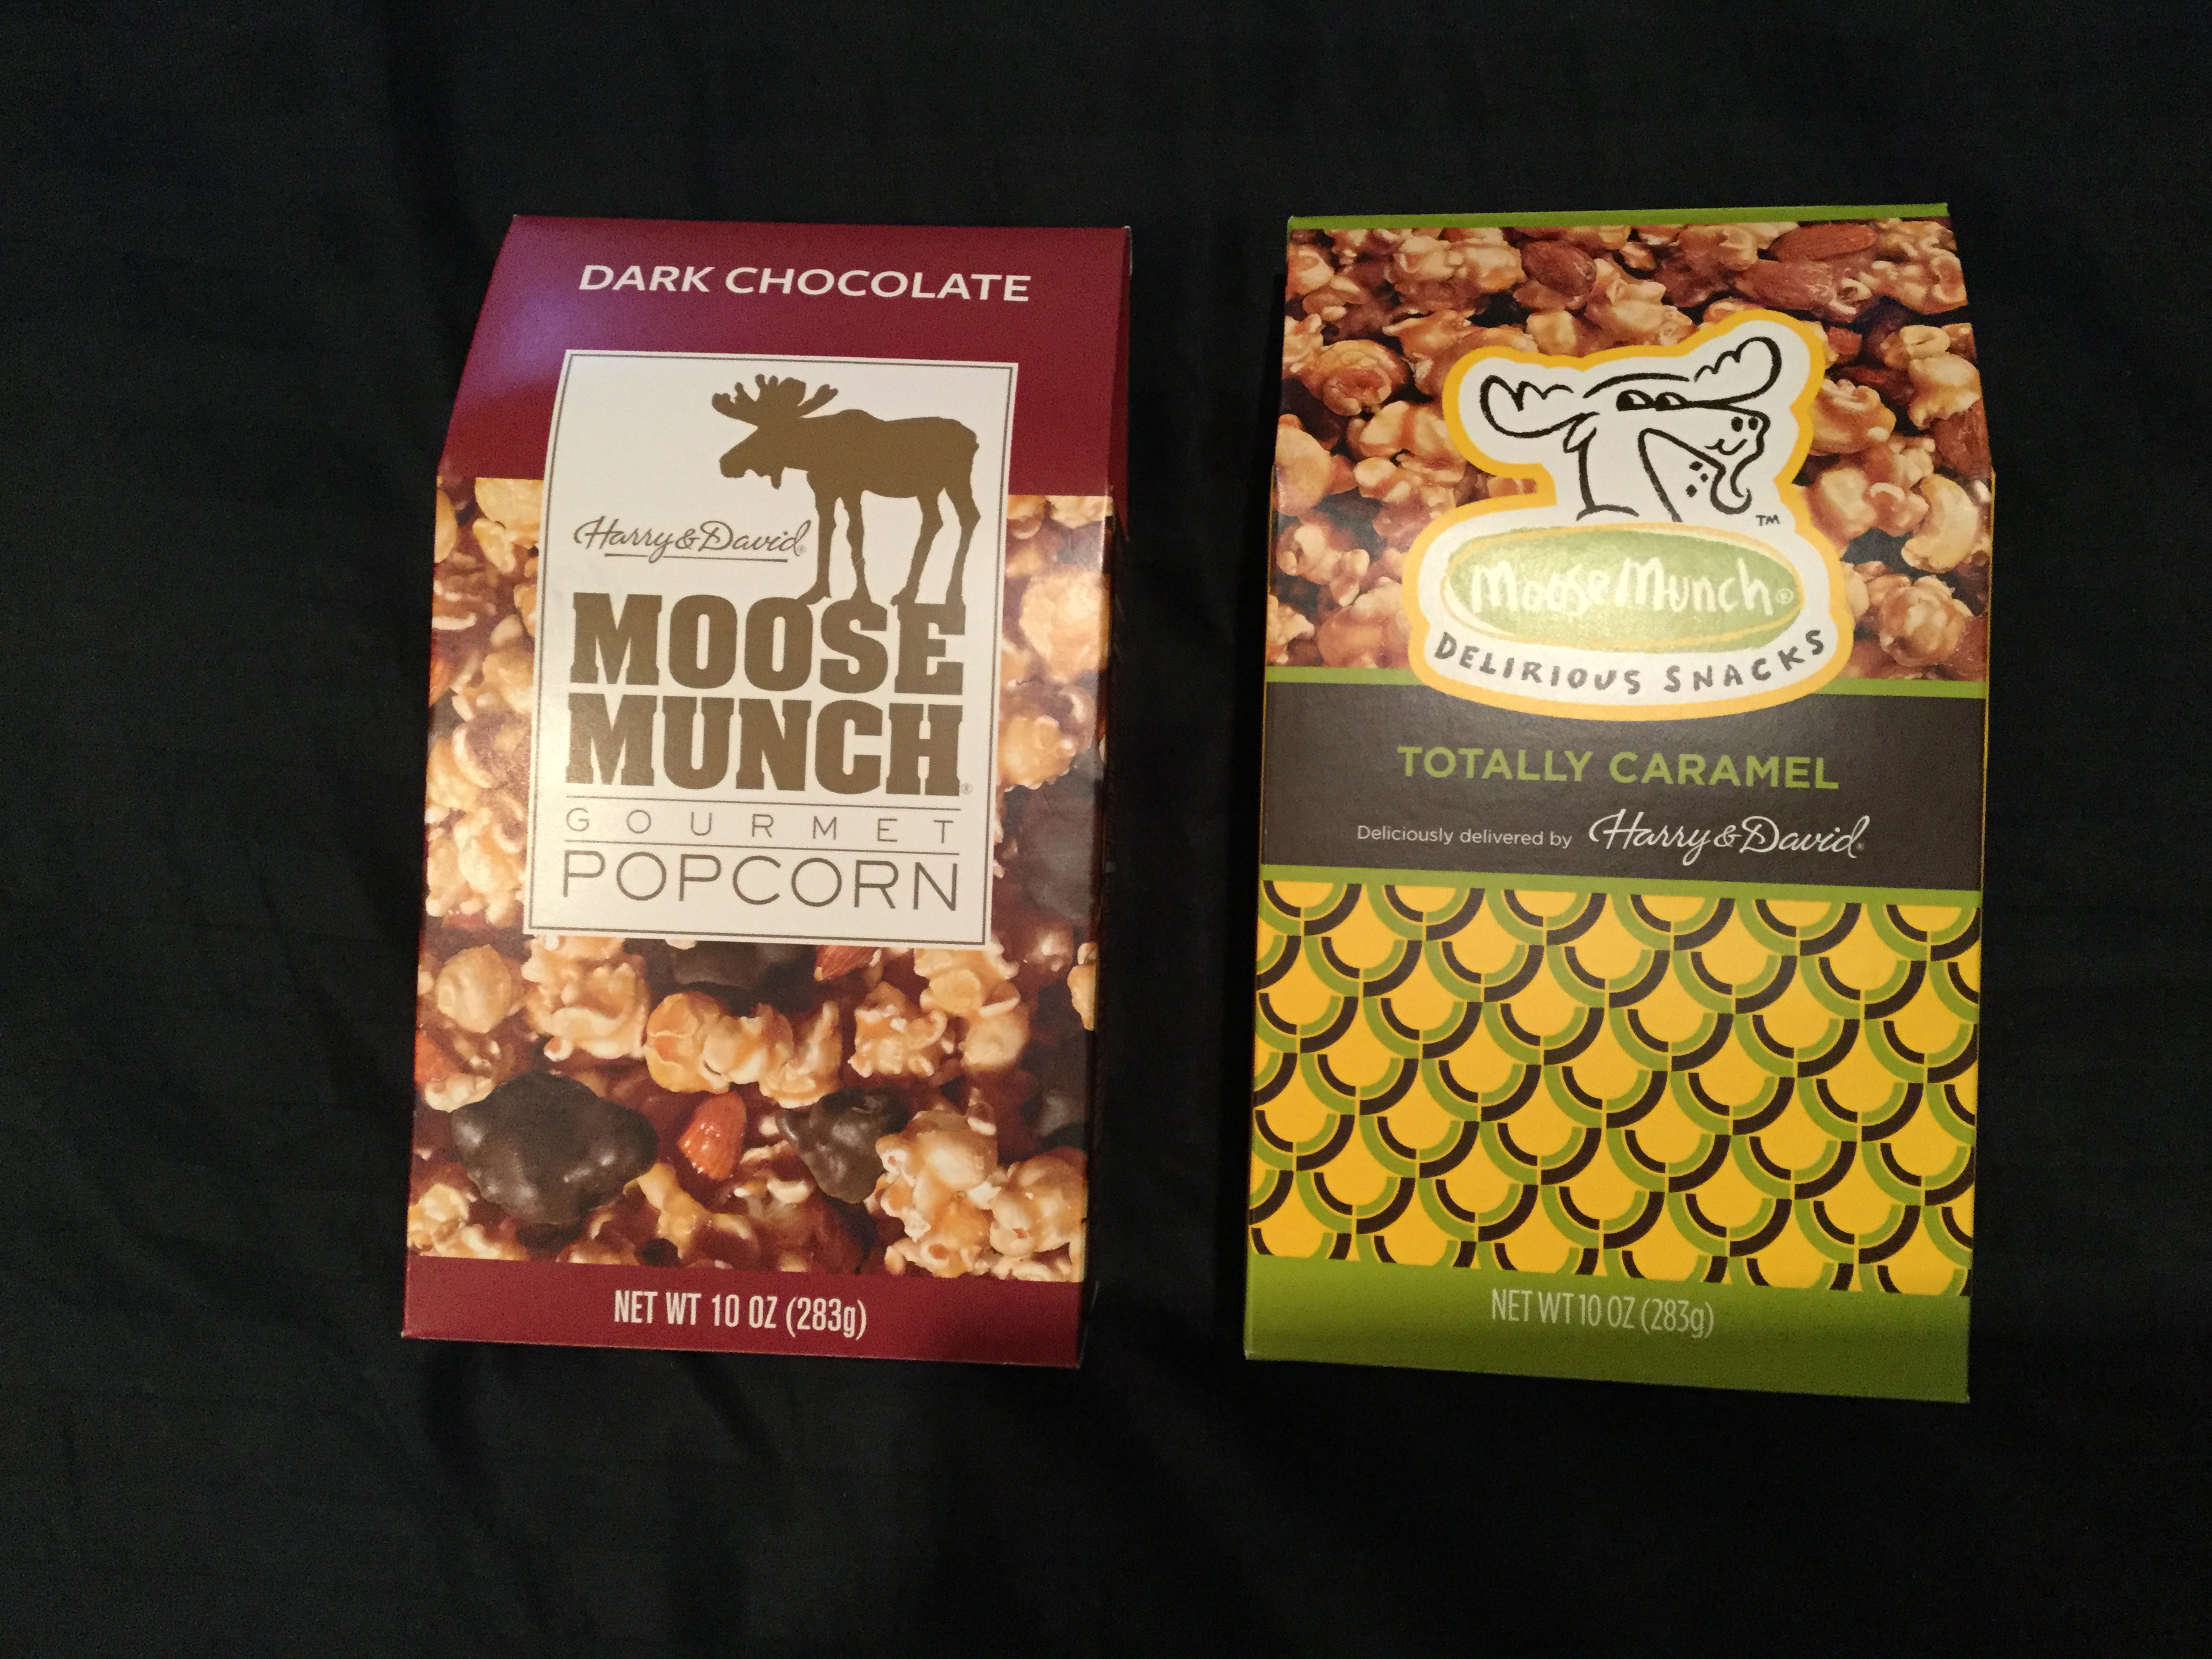 Moose Munch Dark Chocolate Popcorn Totally Caramel Home Goods Delray Beach